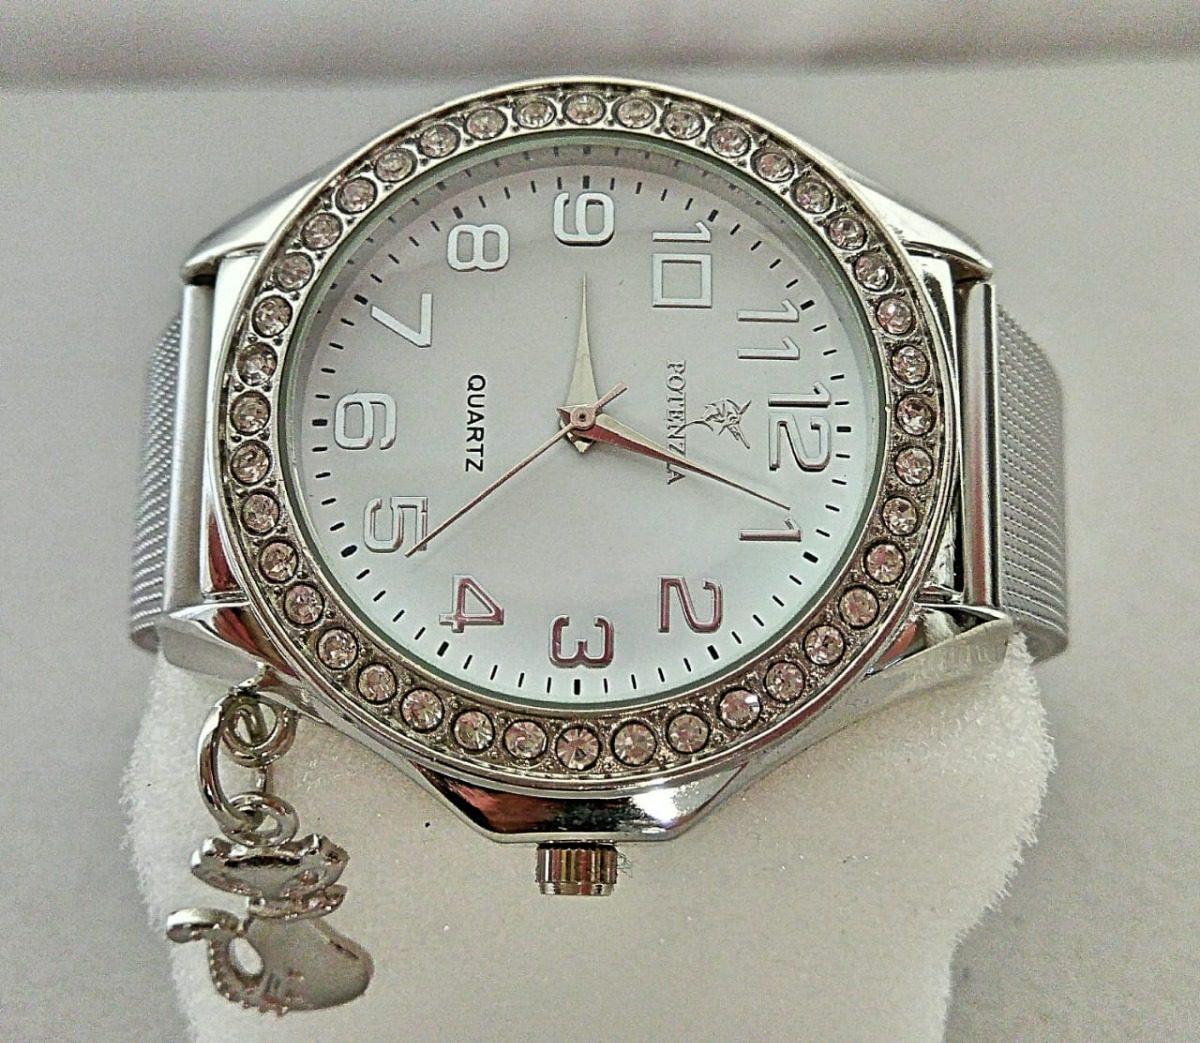 1b448761e96 relógio de pulso marca famosa juvenil mulher feminino barato. Carregando  zoom.